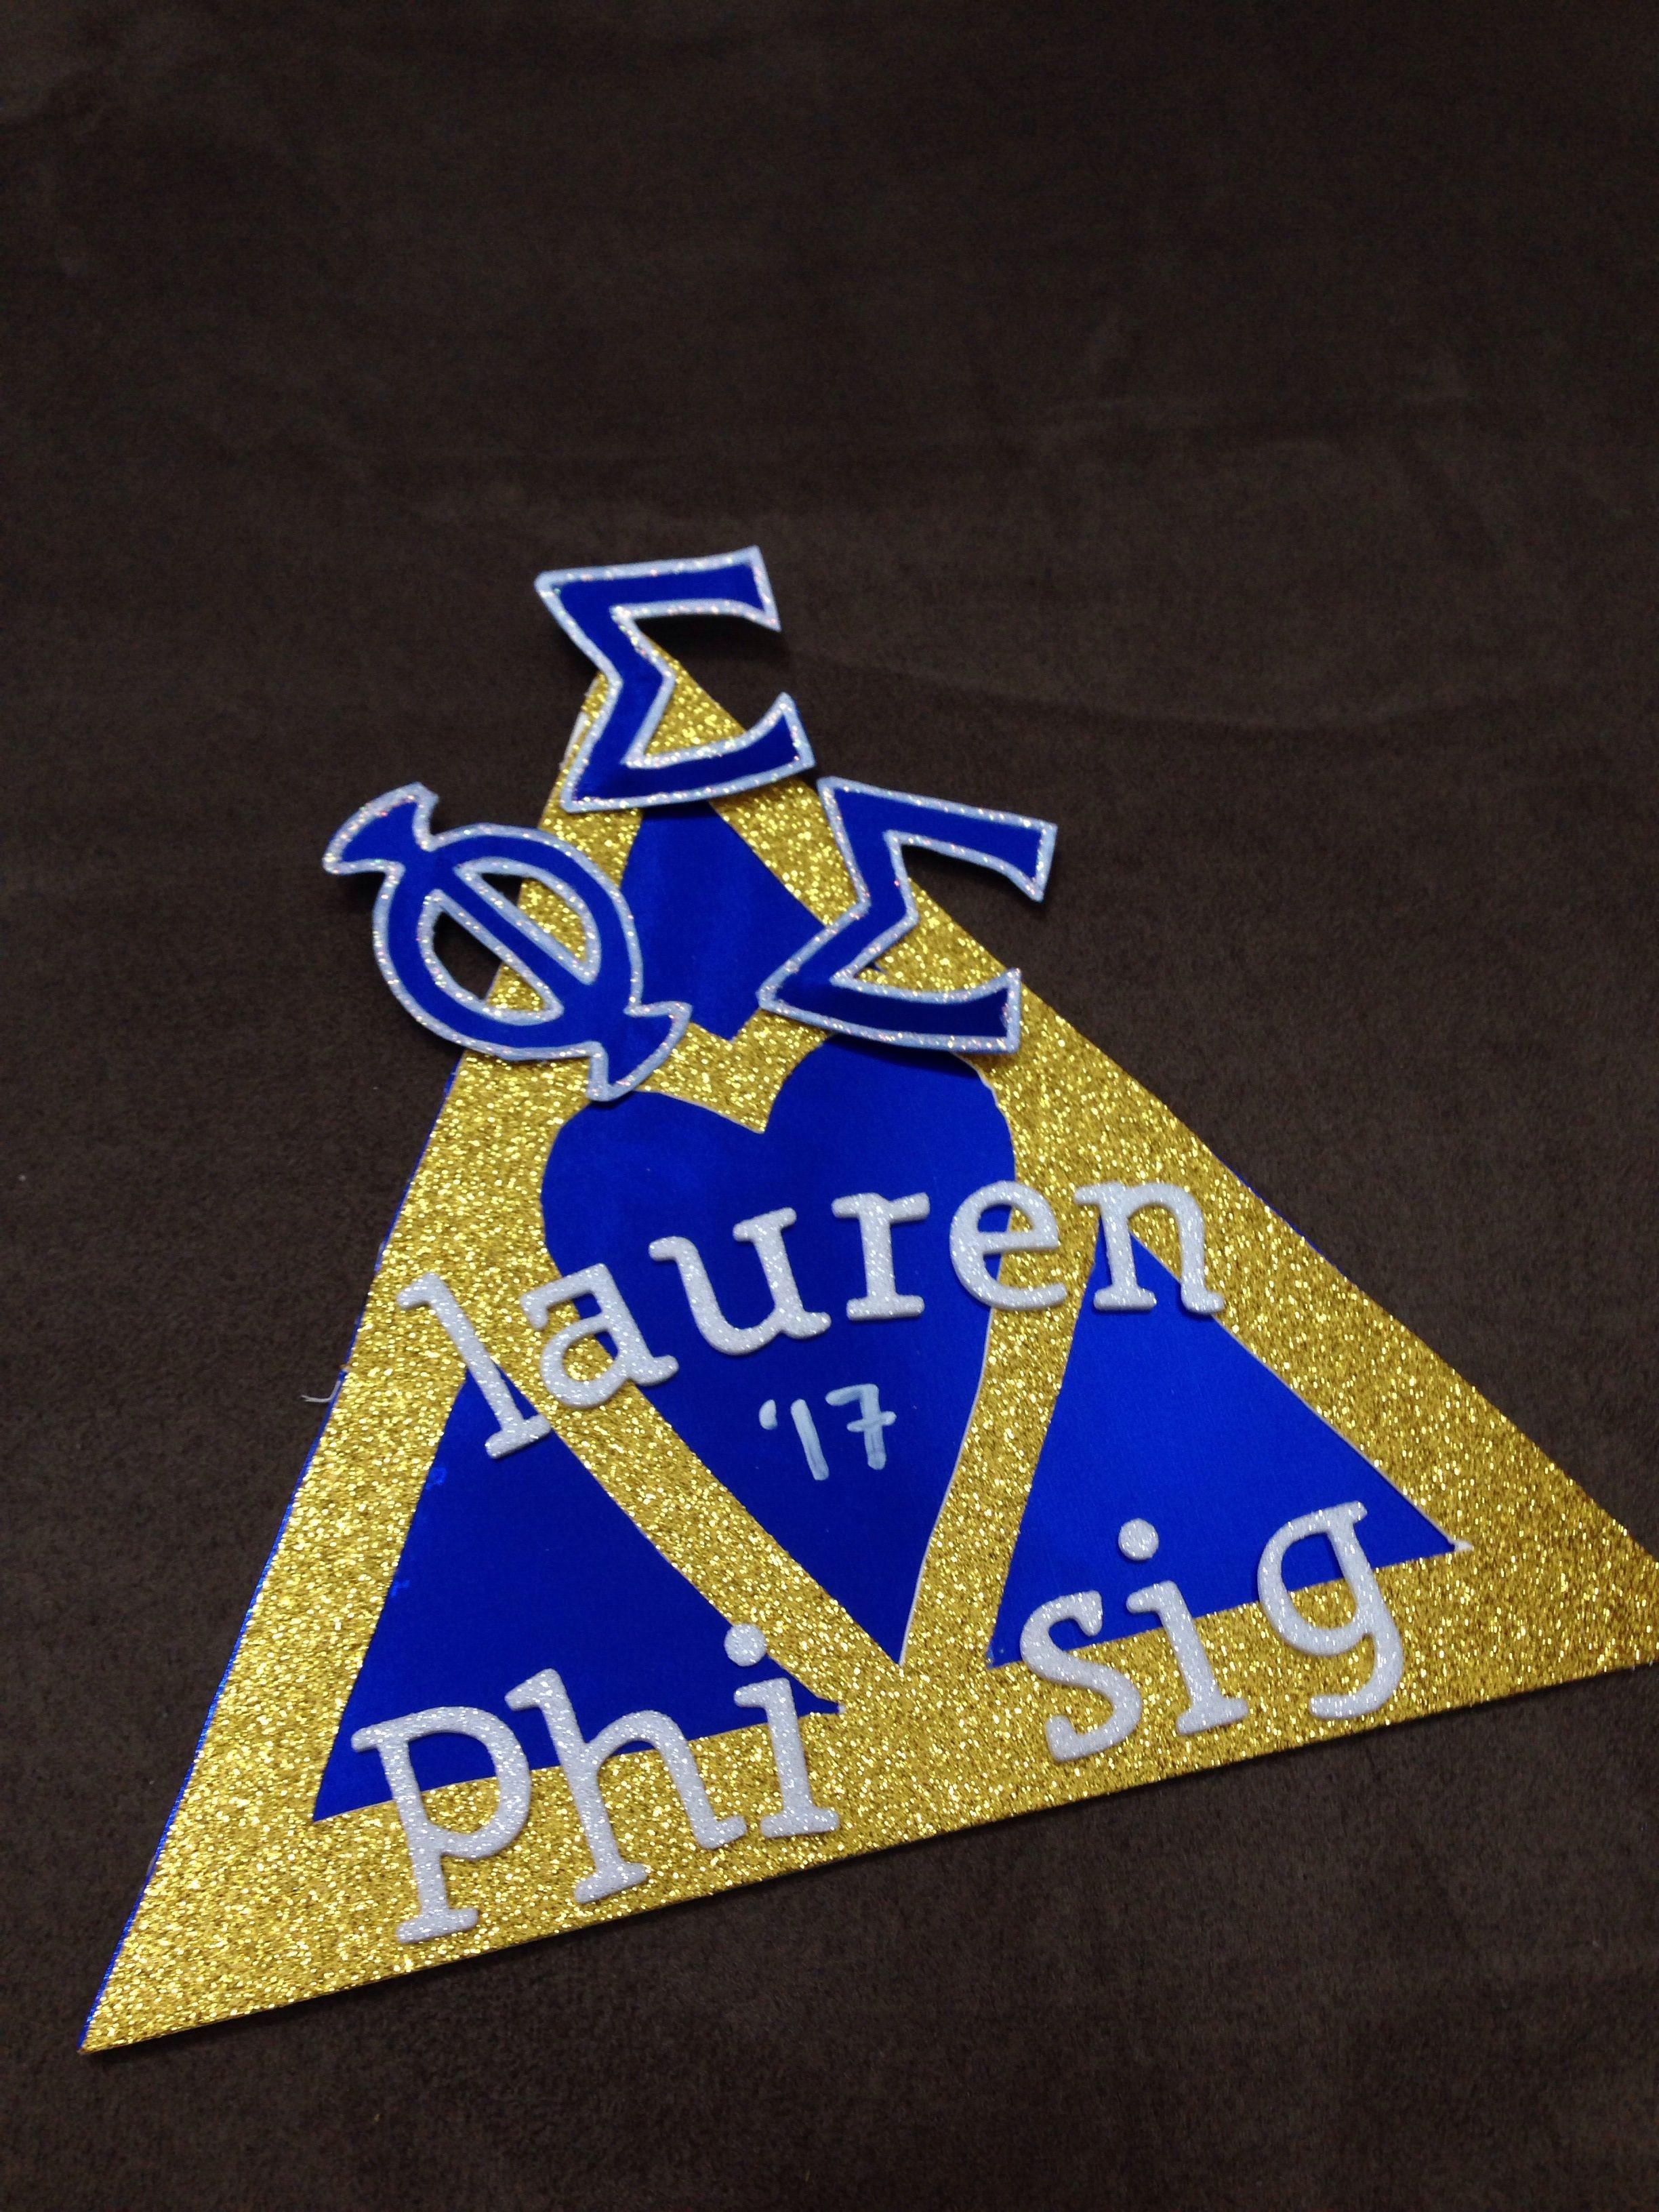 My Rose Buddys Phi Sigma Sigma Door Dec Litp S O R O R I T Y